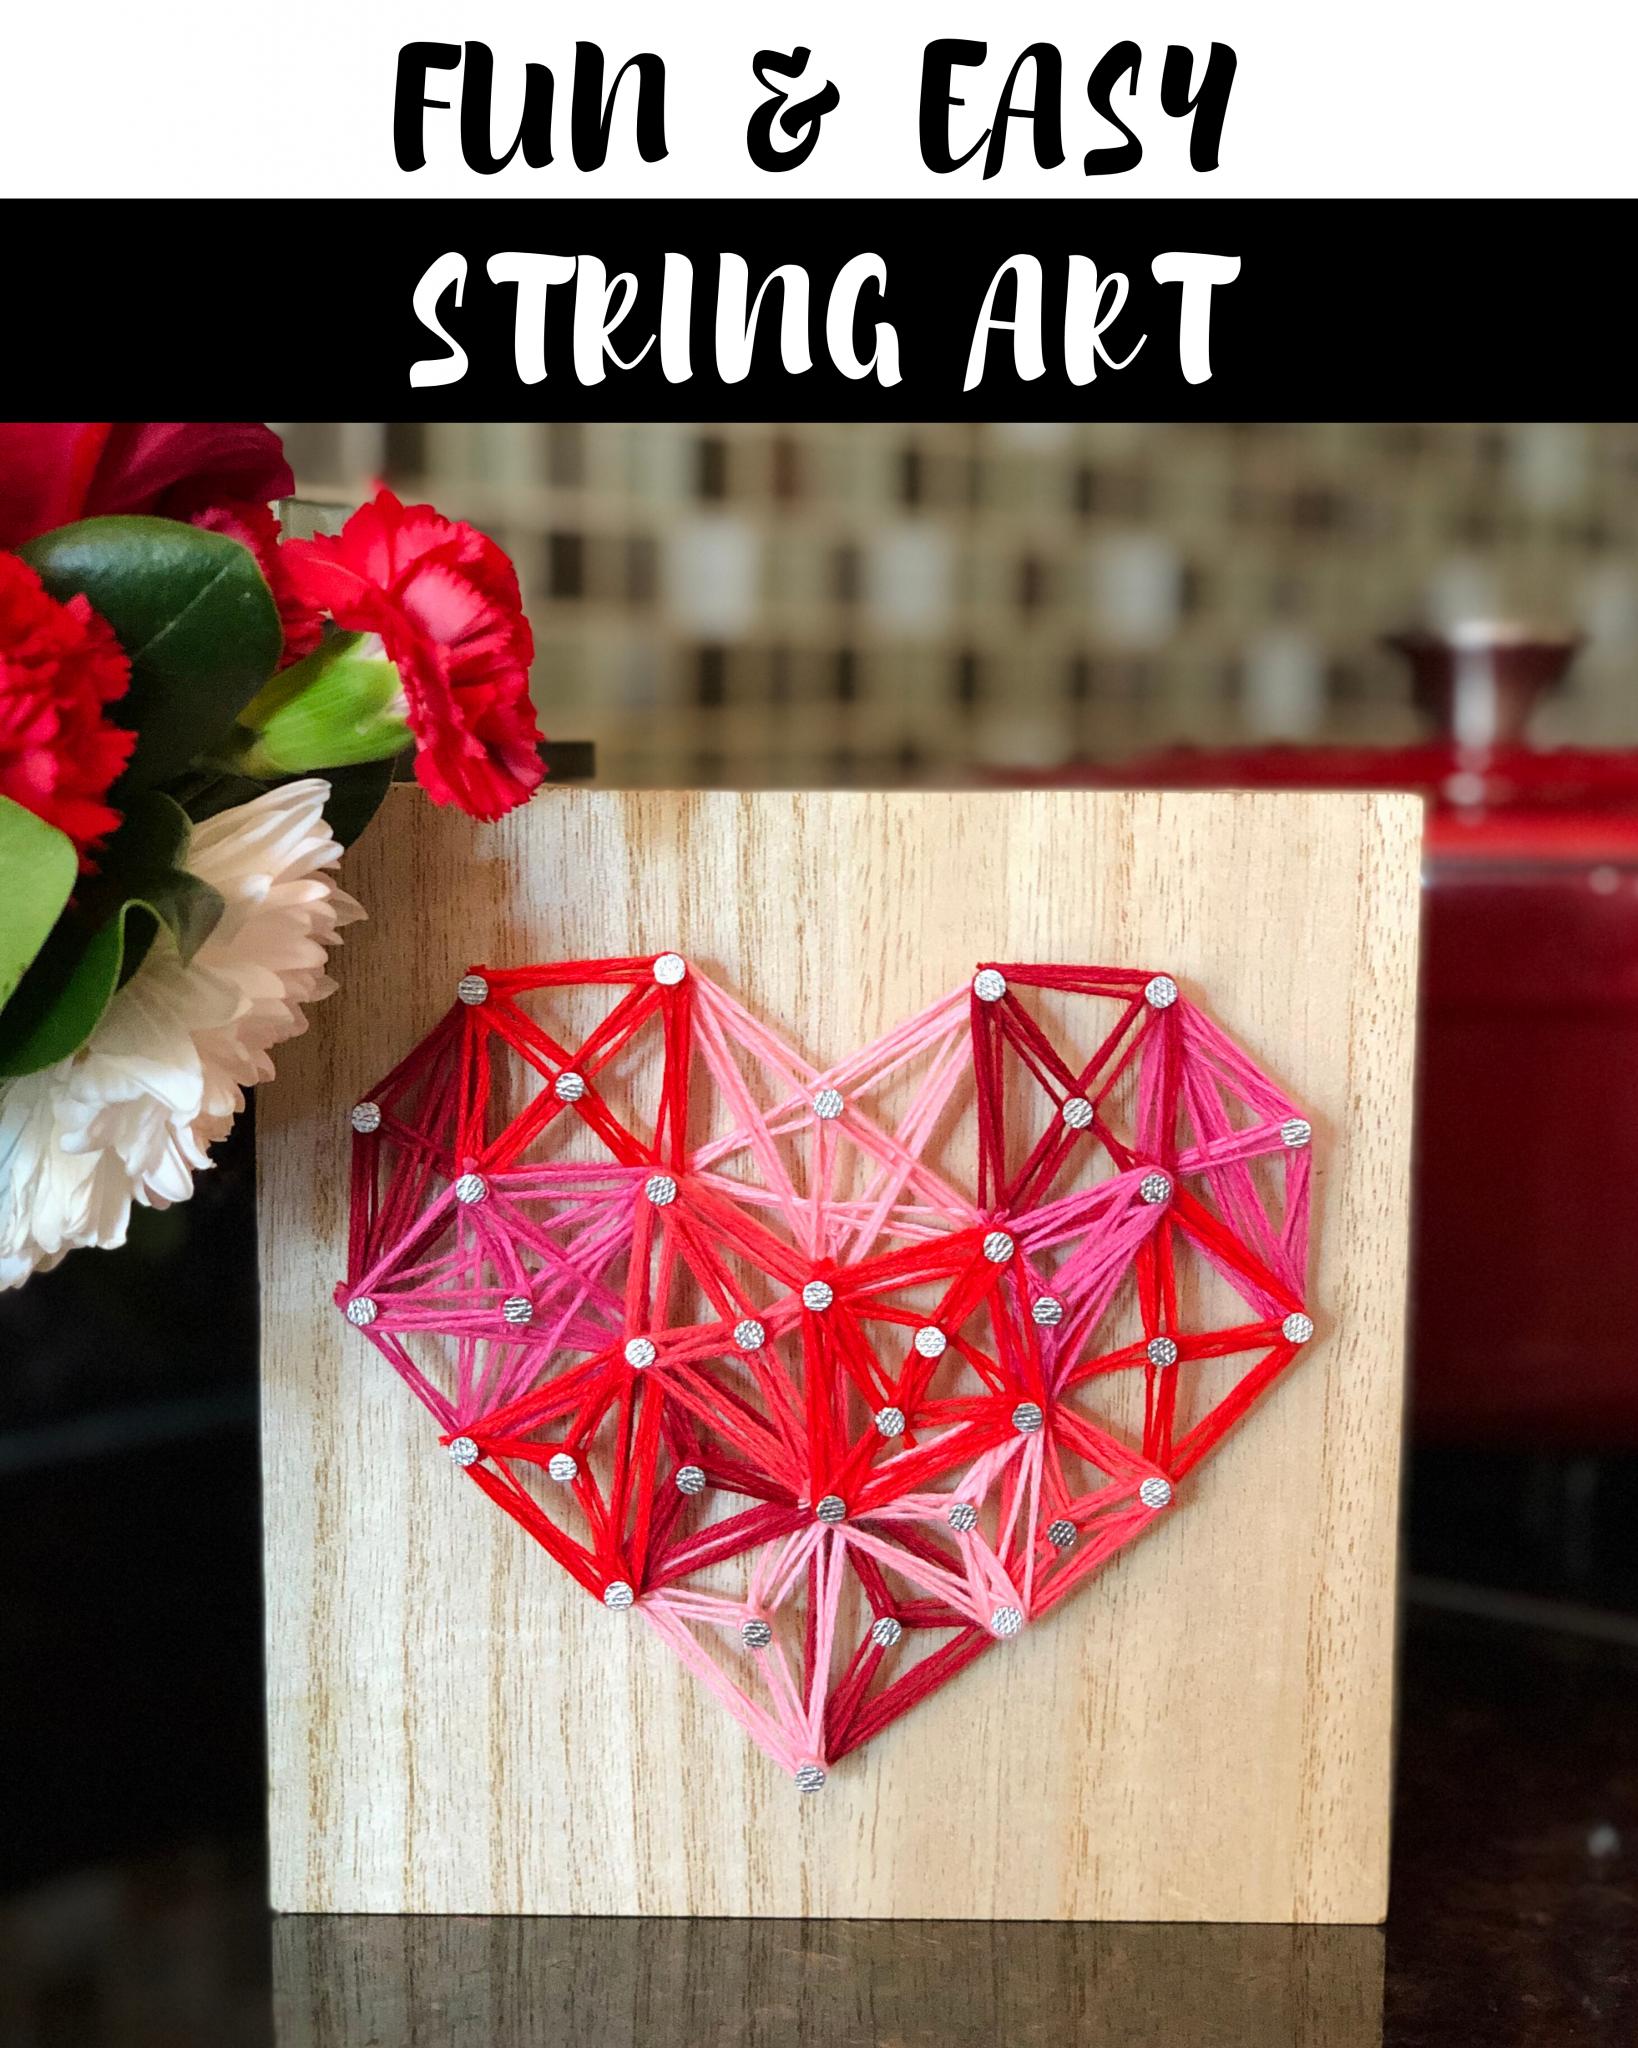 Fun & Easy Heart String Art